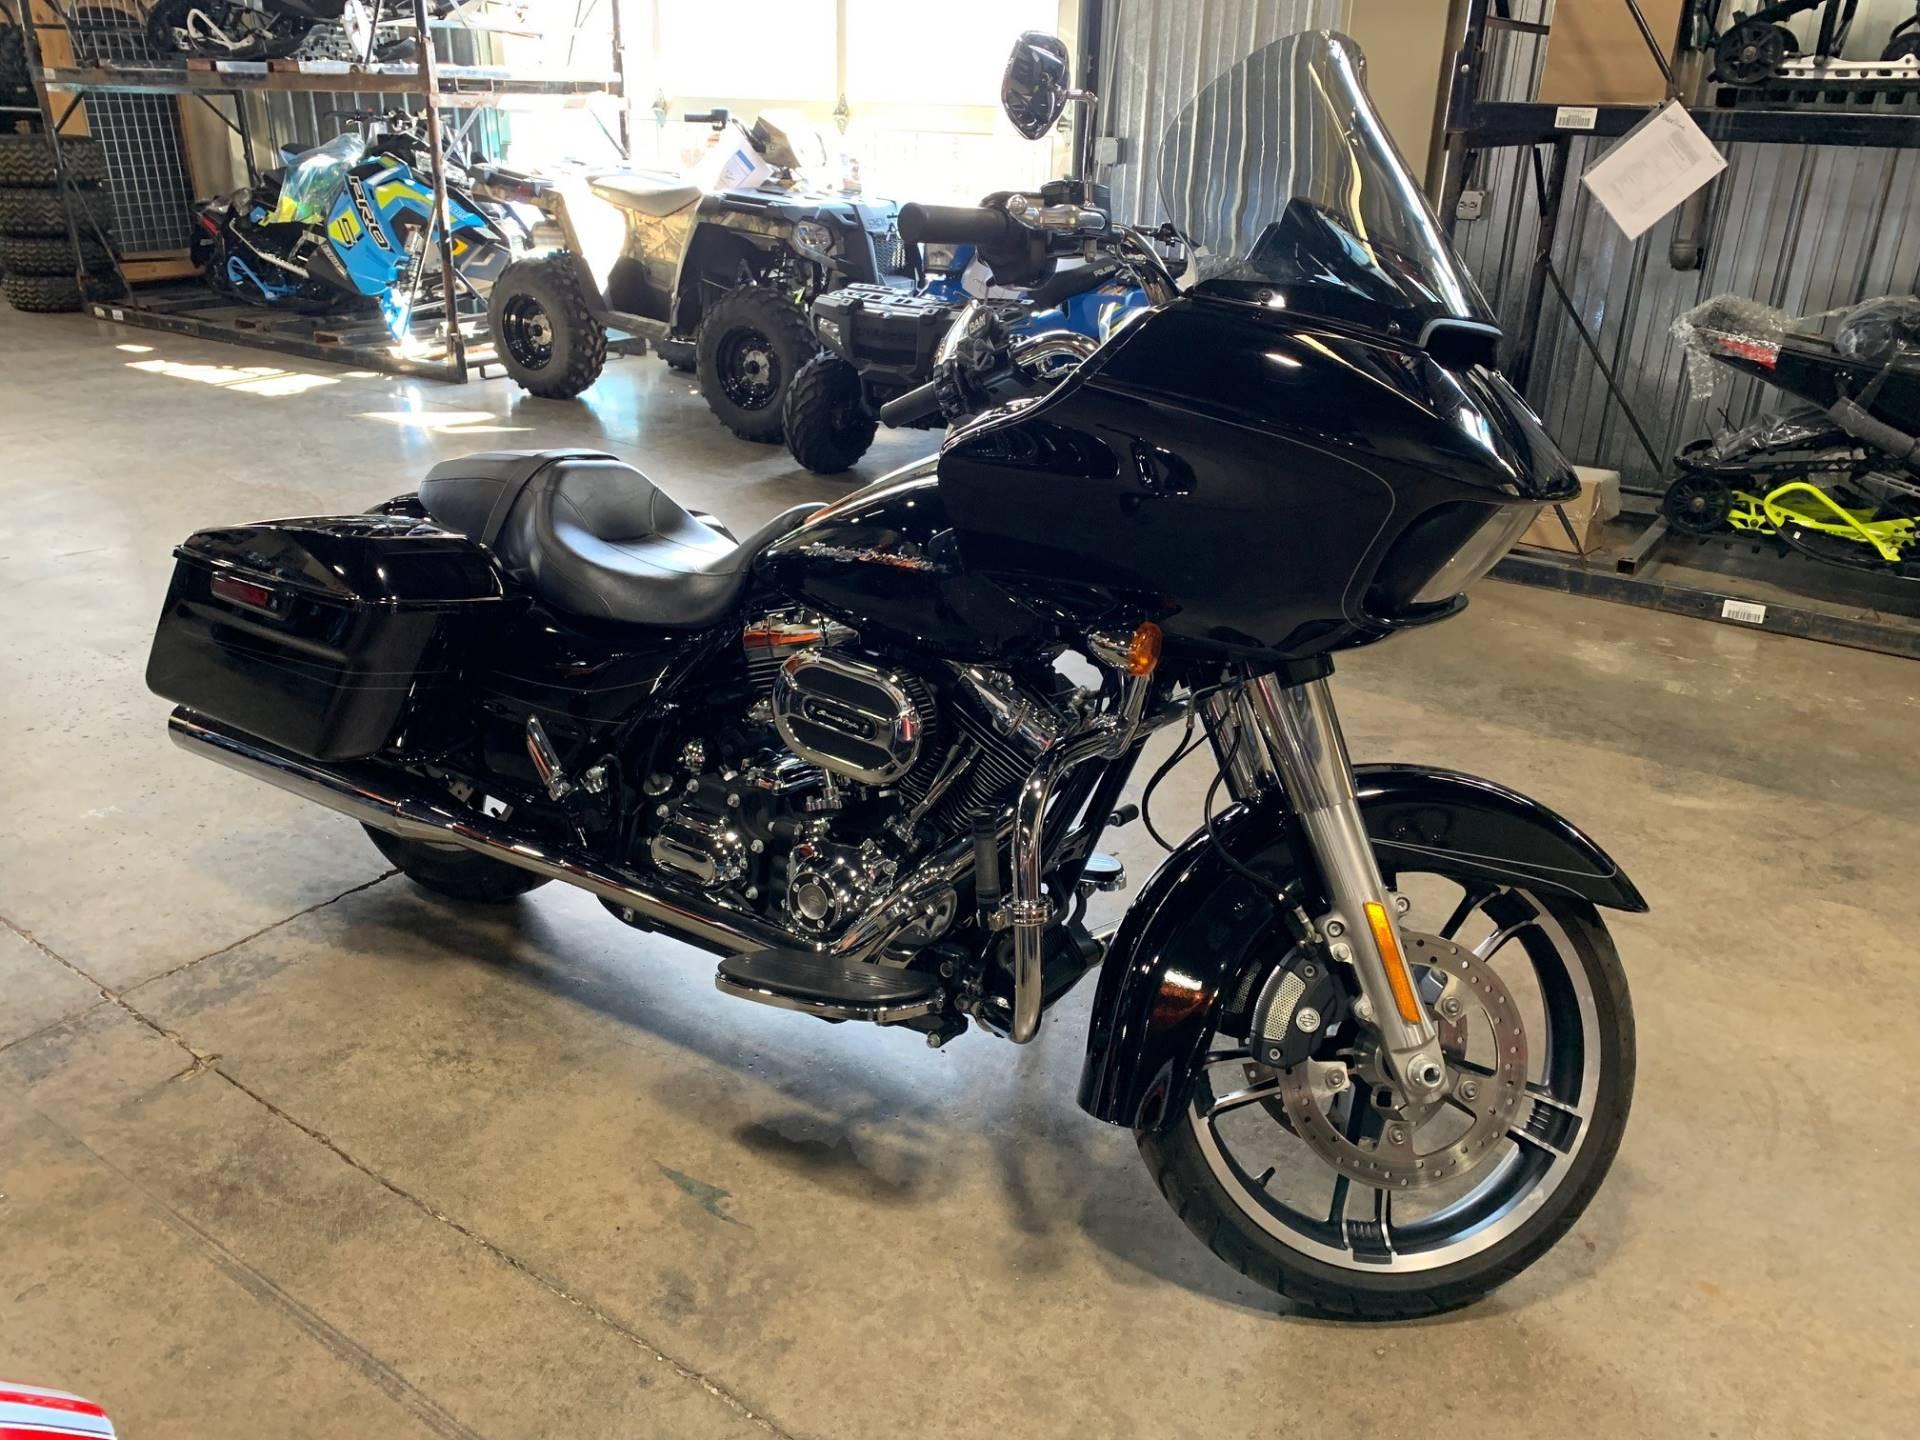 2015 Harley-Davidson ROAD GLIDE SPECIAL 1